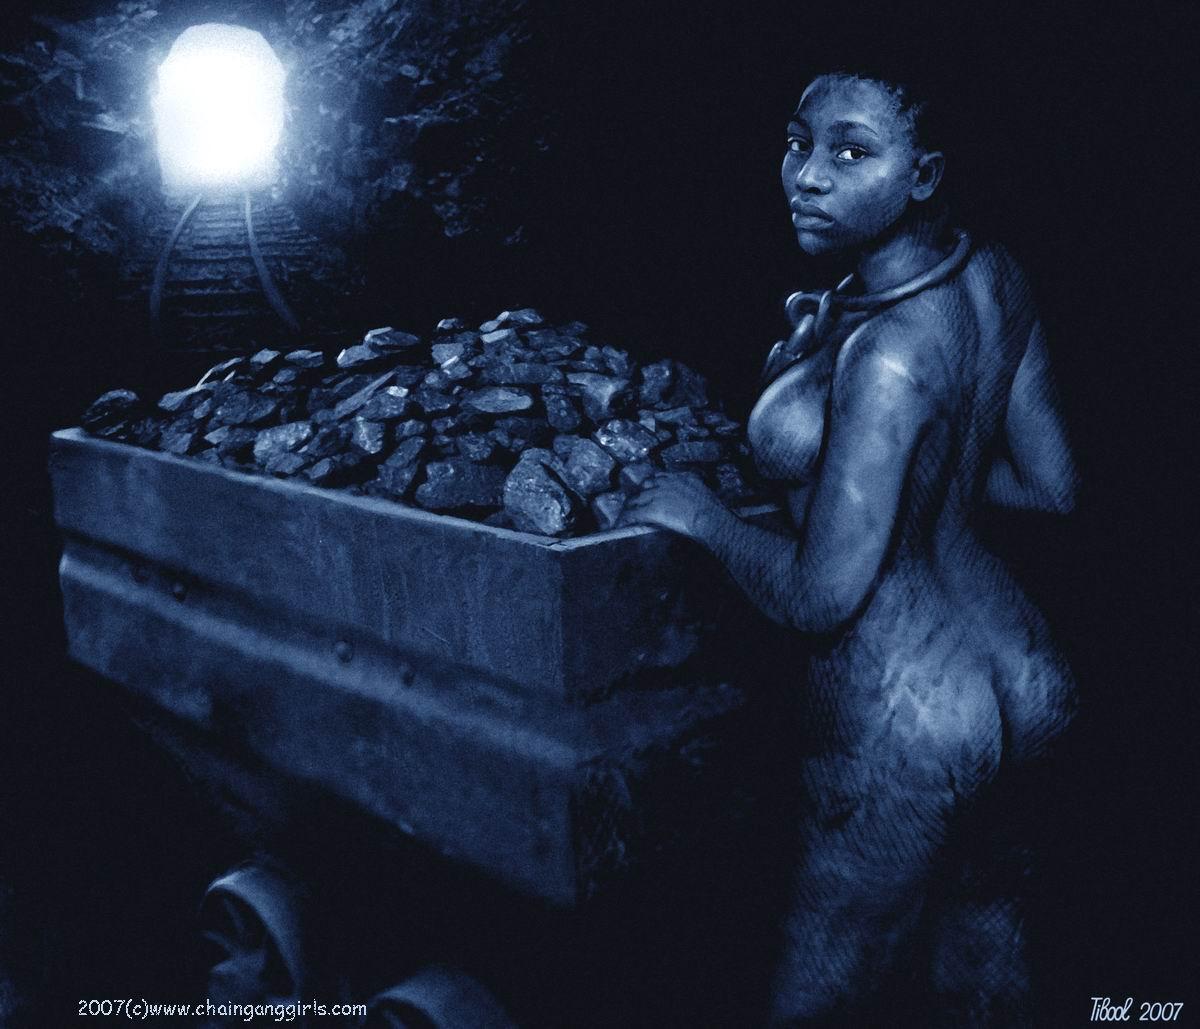 Remarkable, Naked slave girl chain gang